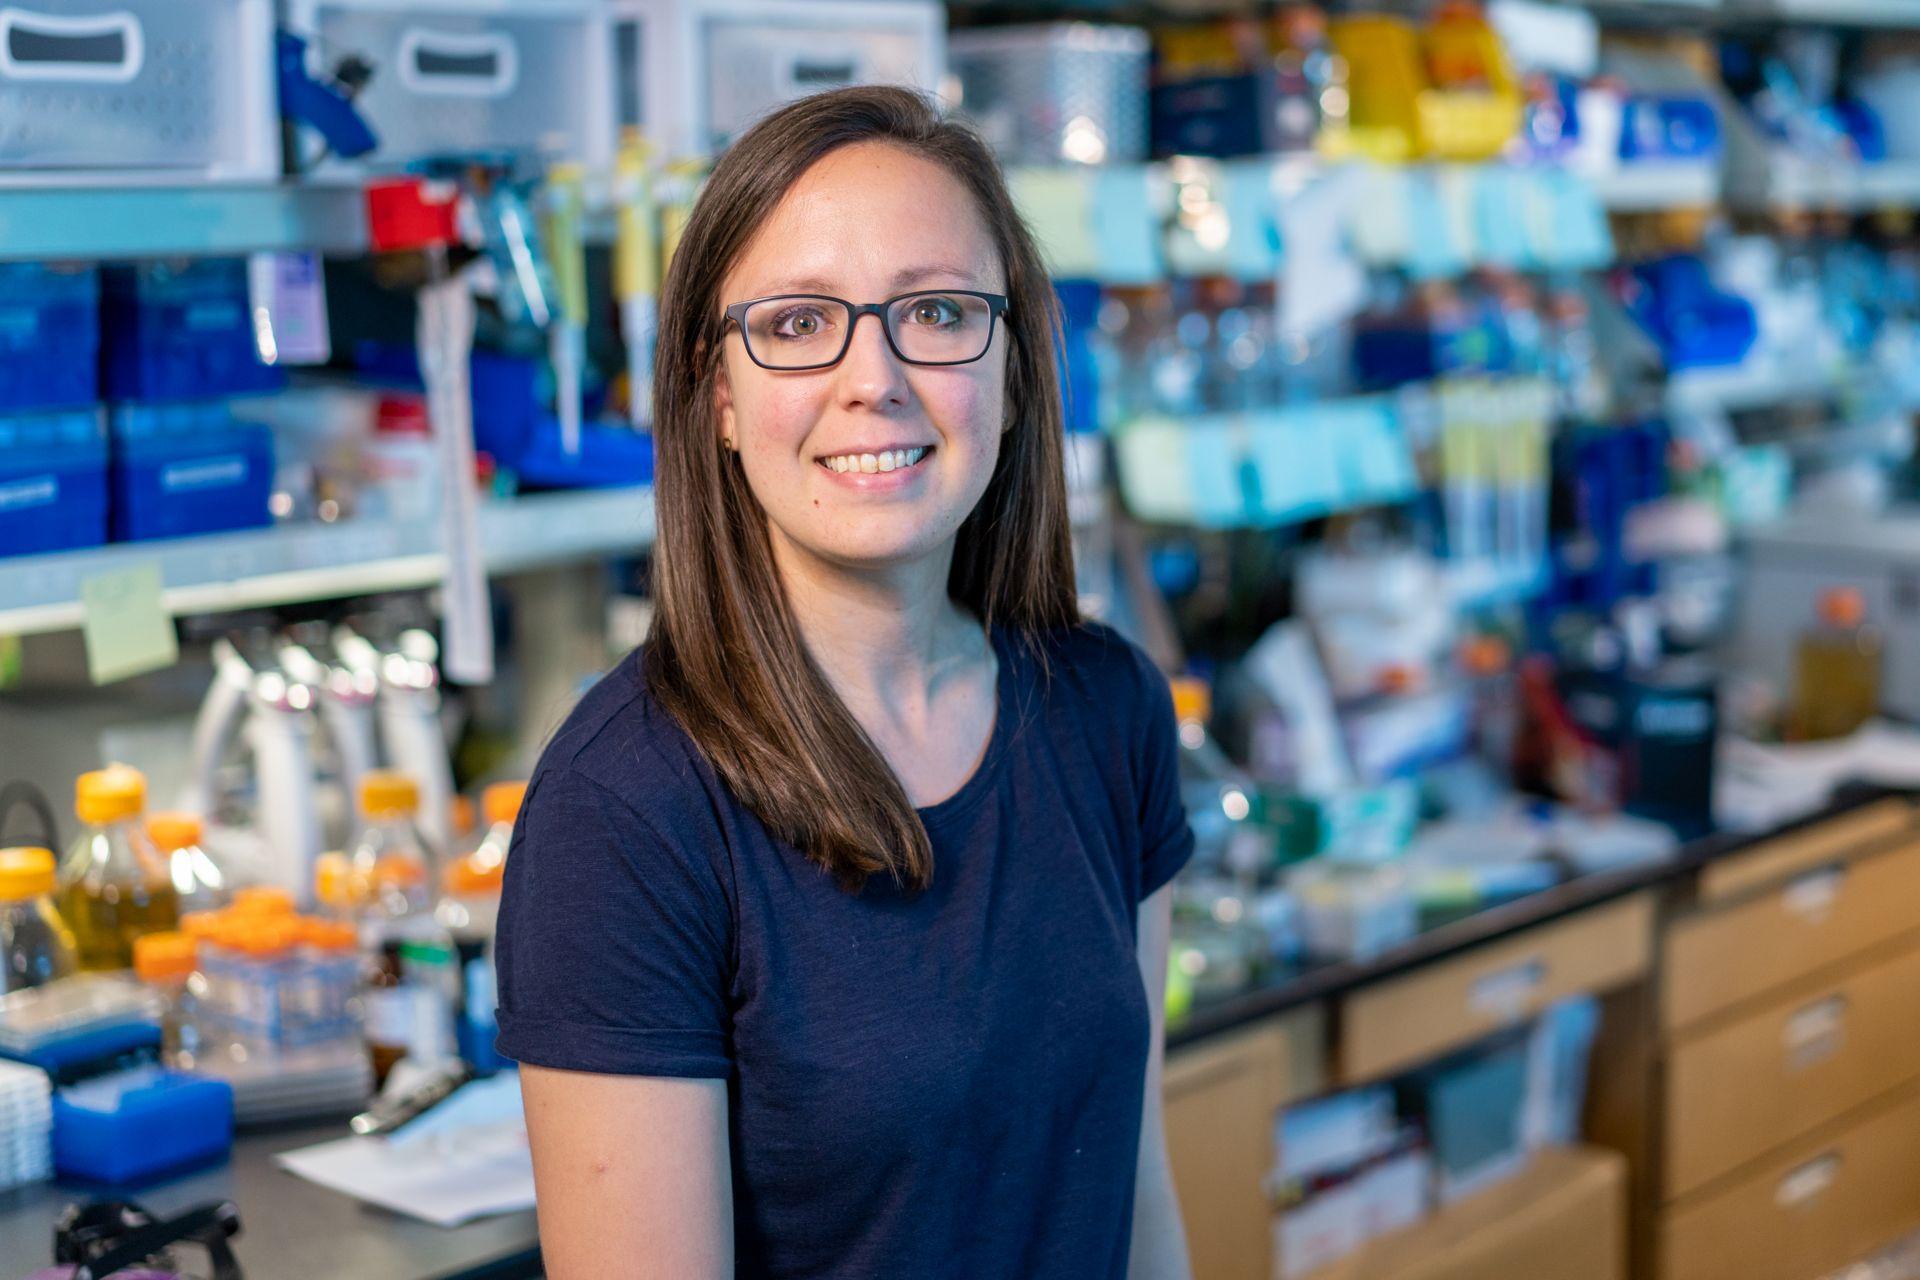 Shelby Anderson, PhD